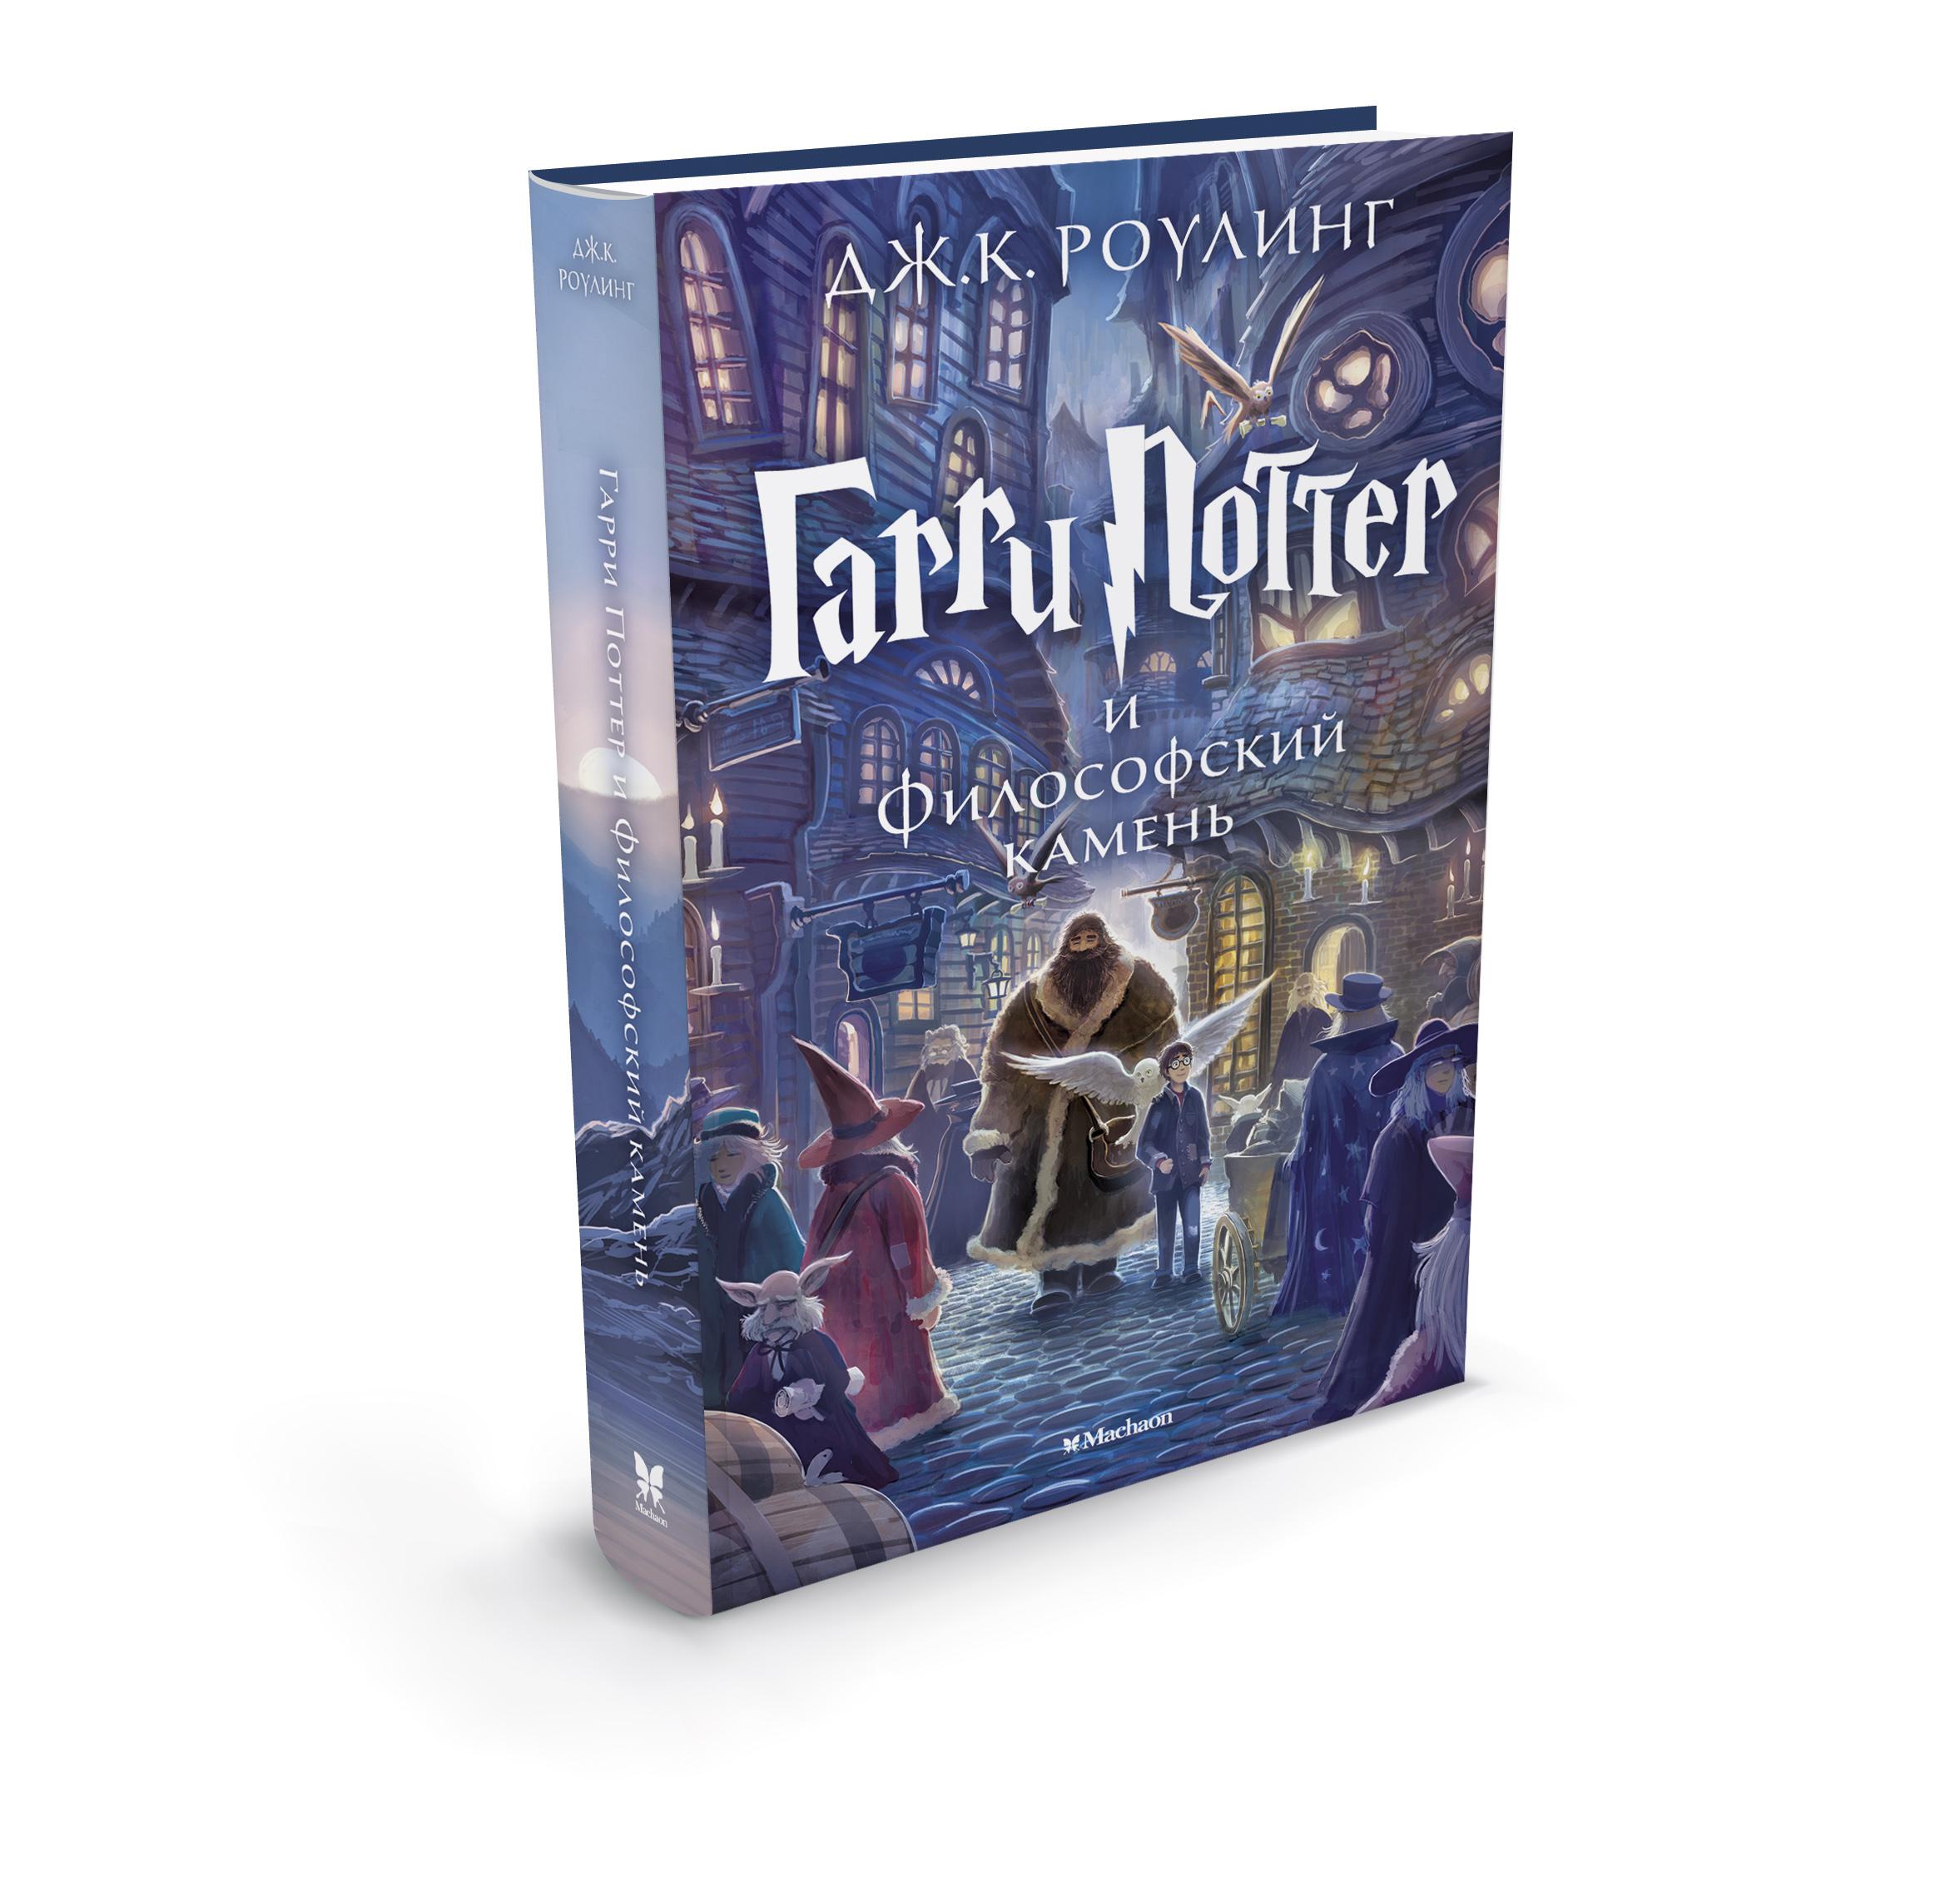 New Harry Potter